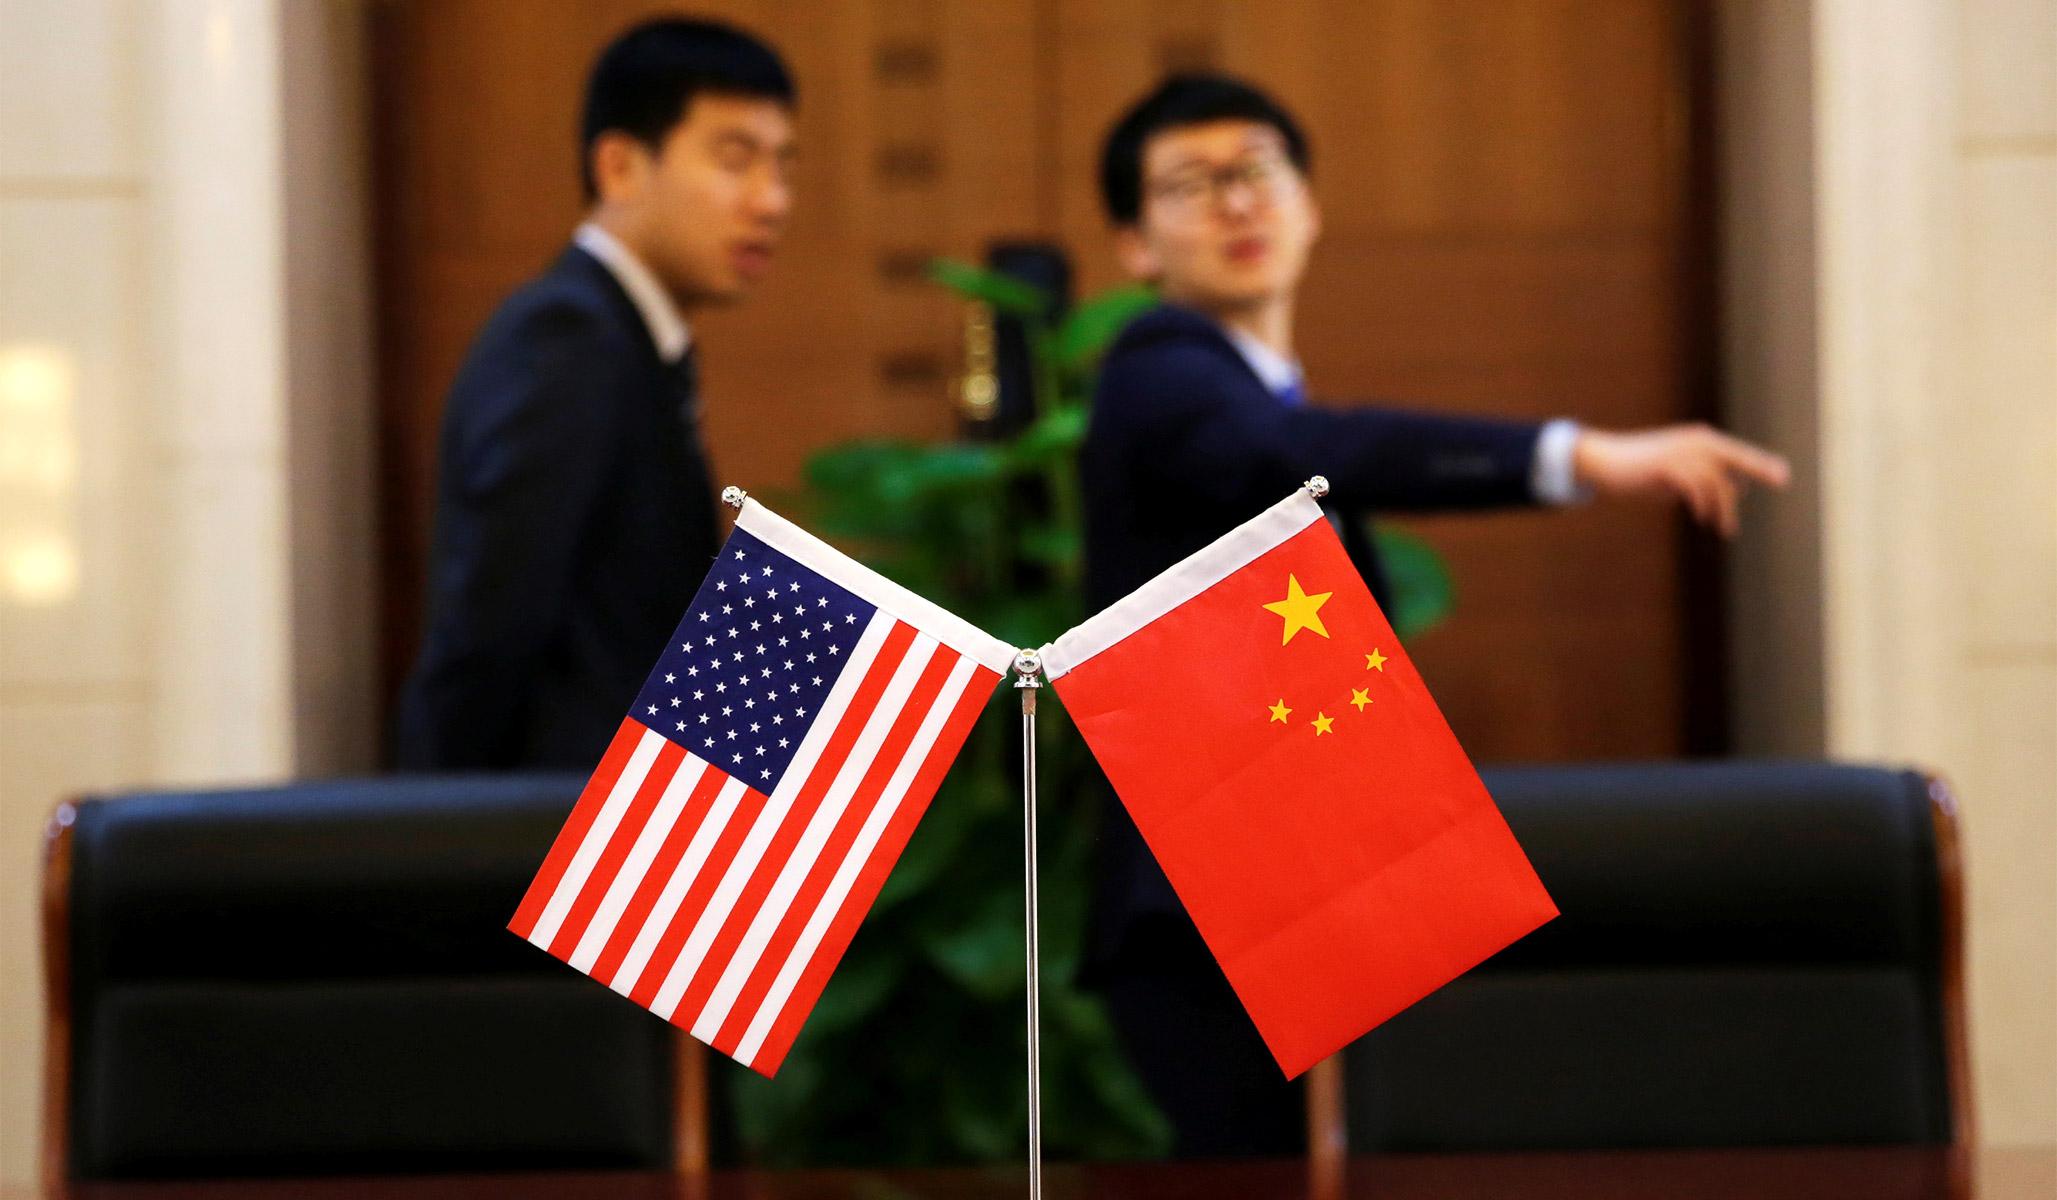 China Threatens $2.4 Billion Sanctions Against U.S. For Obama-Era Tariffs Cases